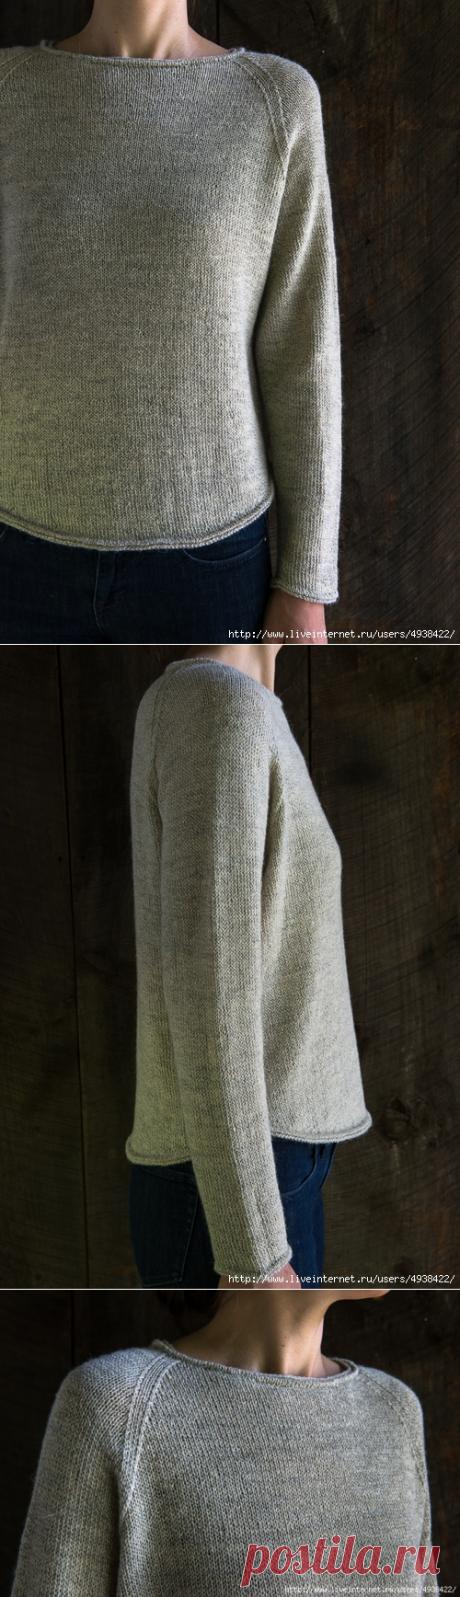 Lightweight Raglan Pullover by Purl Soho.